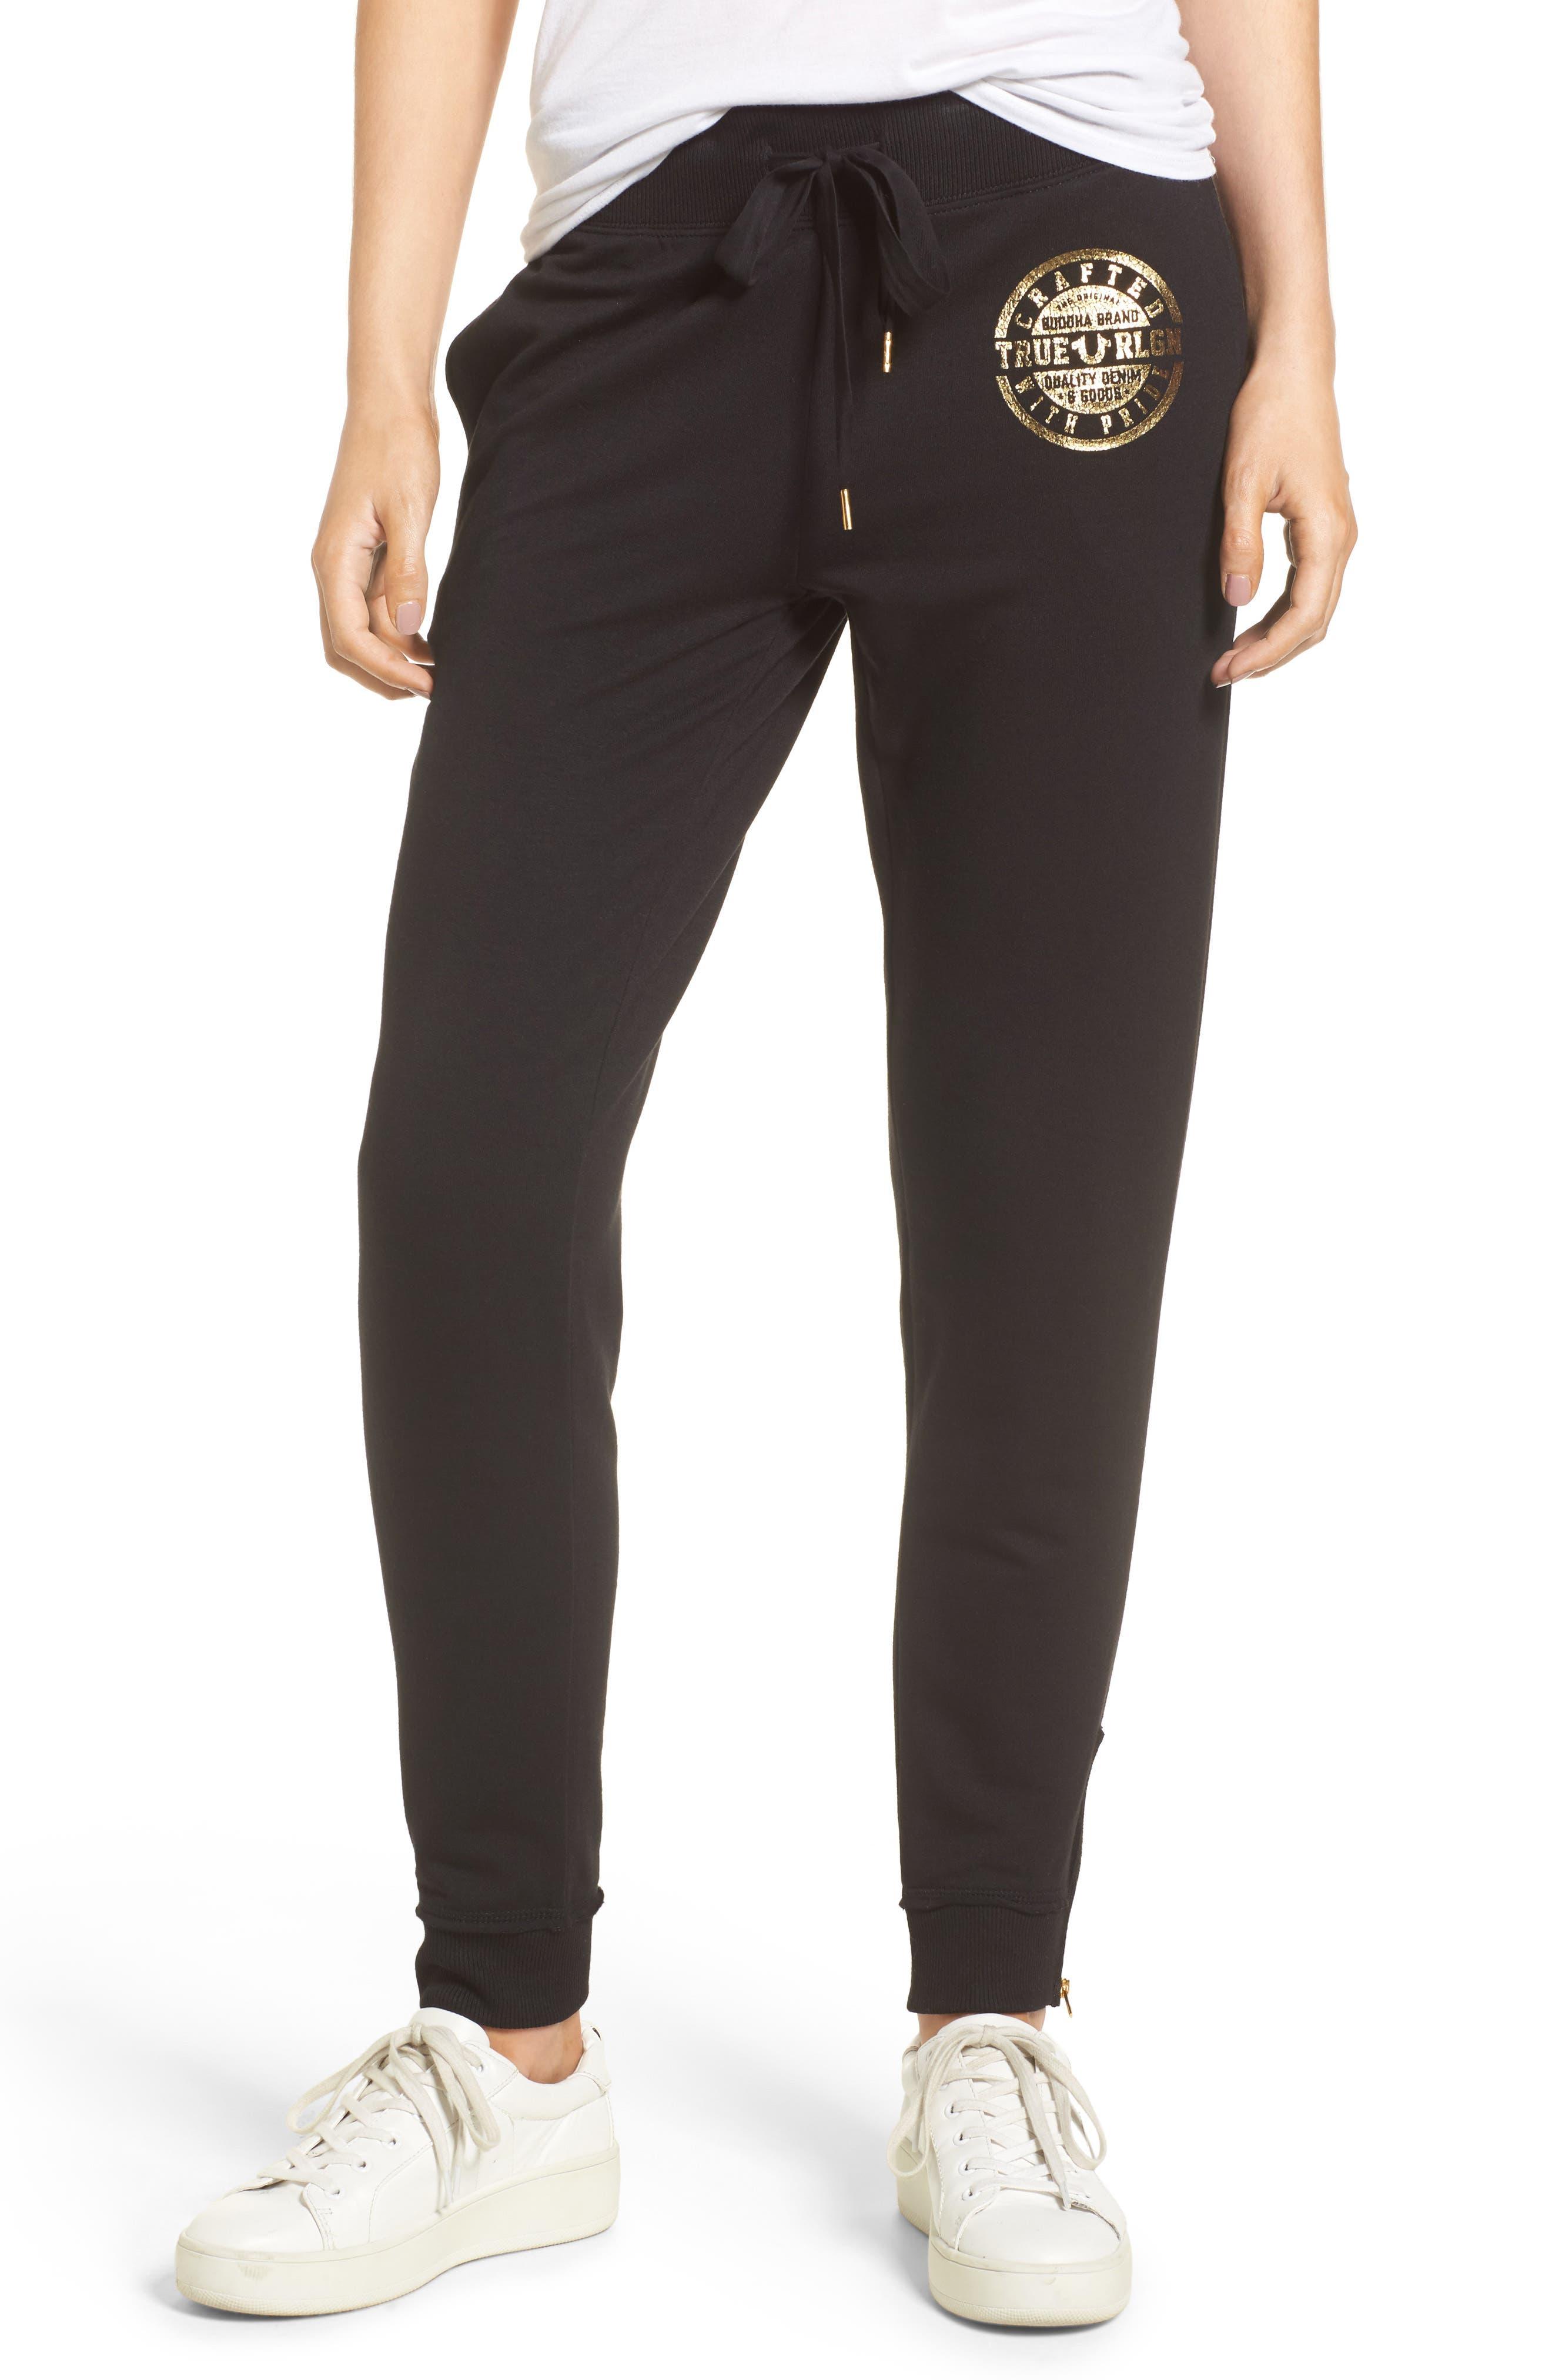 True Religion Brand Jeans Zip Sweatpants